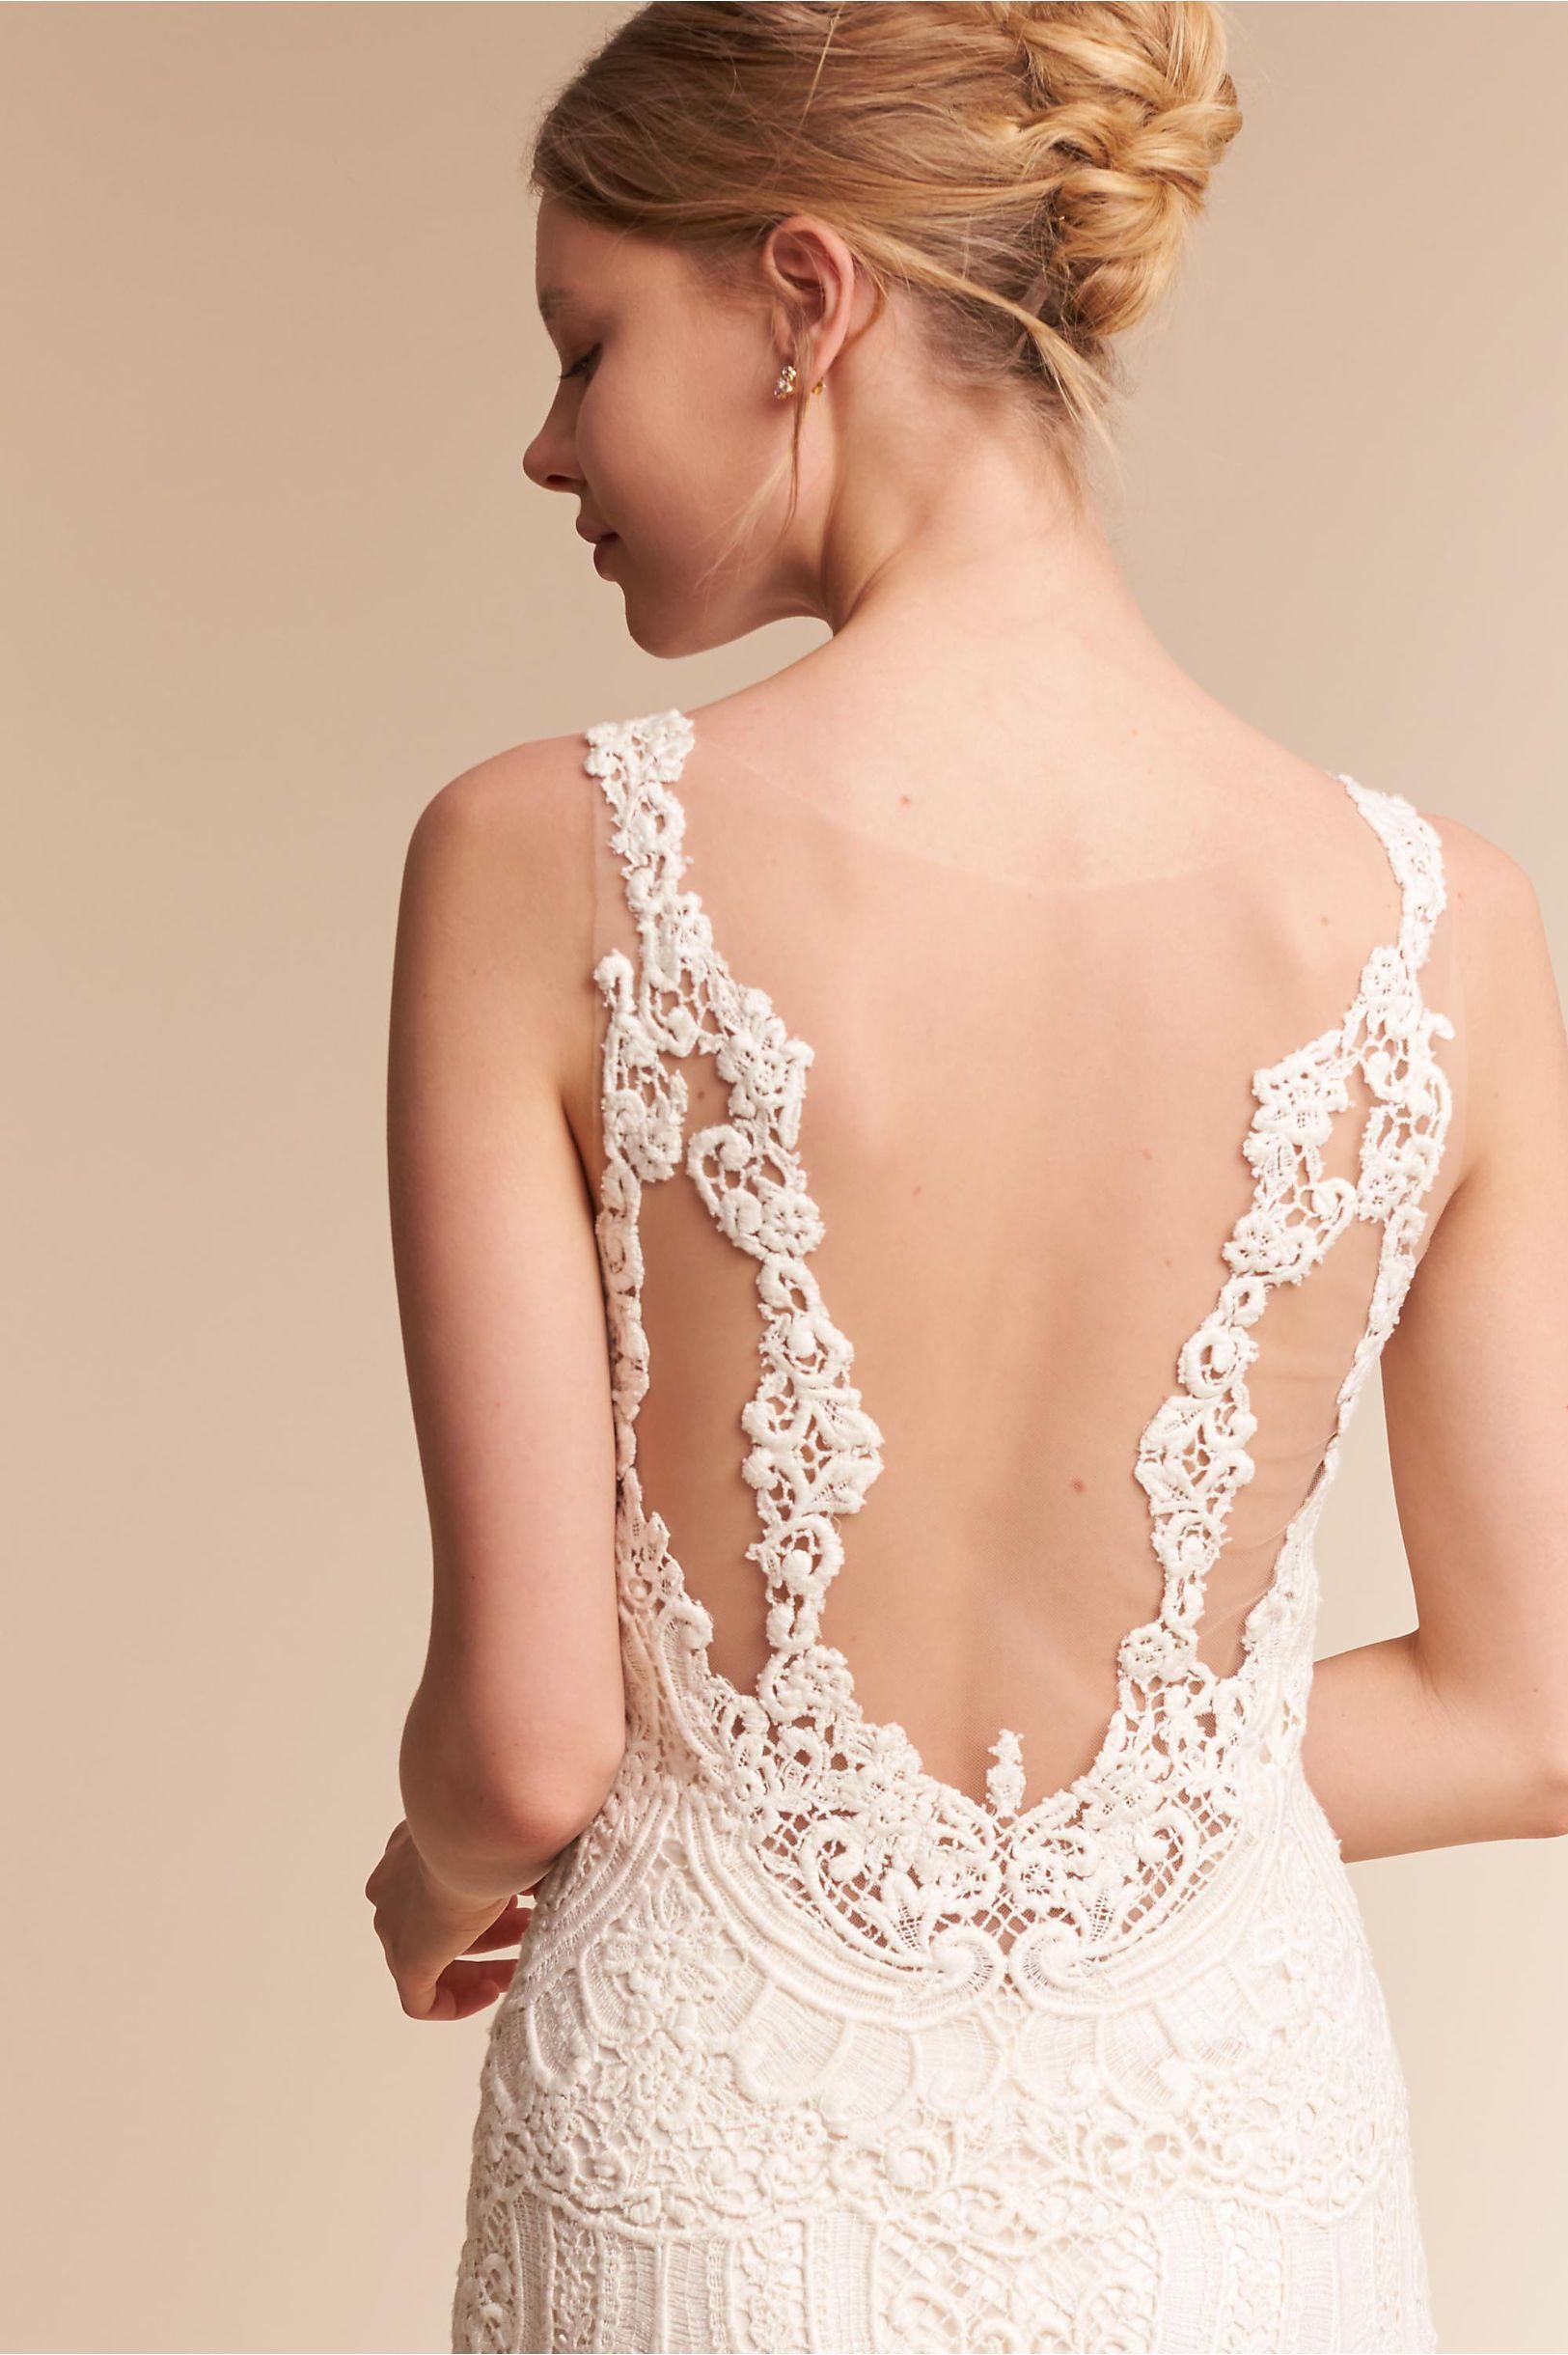 Atherton Gown BHLDN wedding dress Pinterest